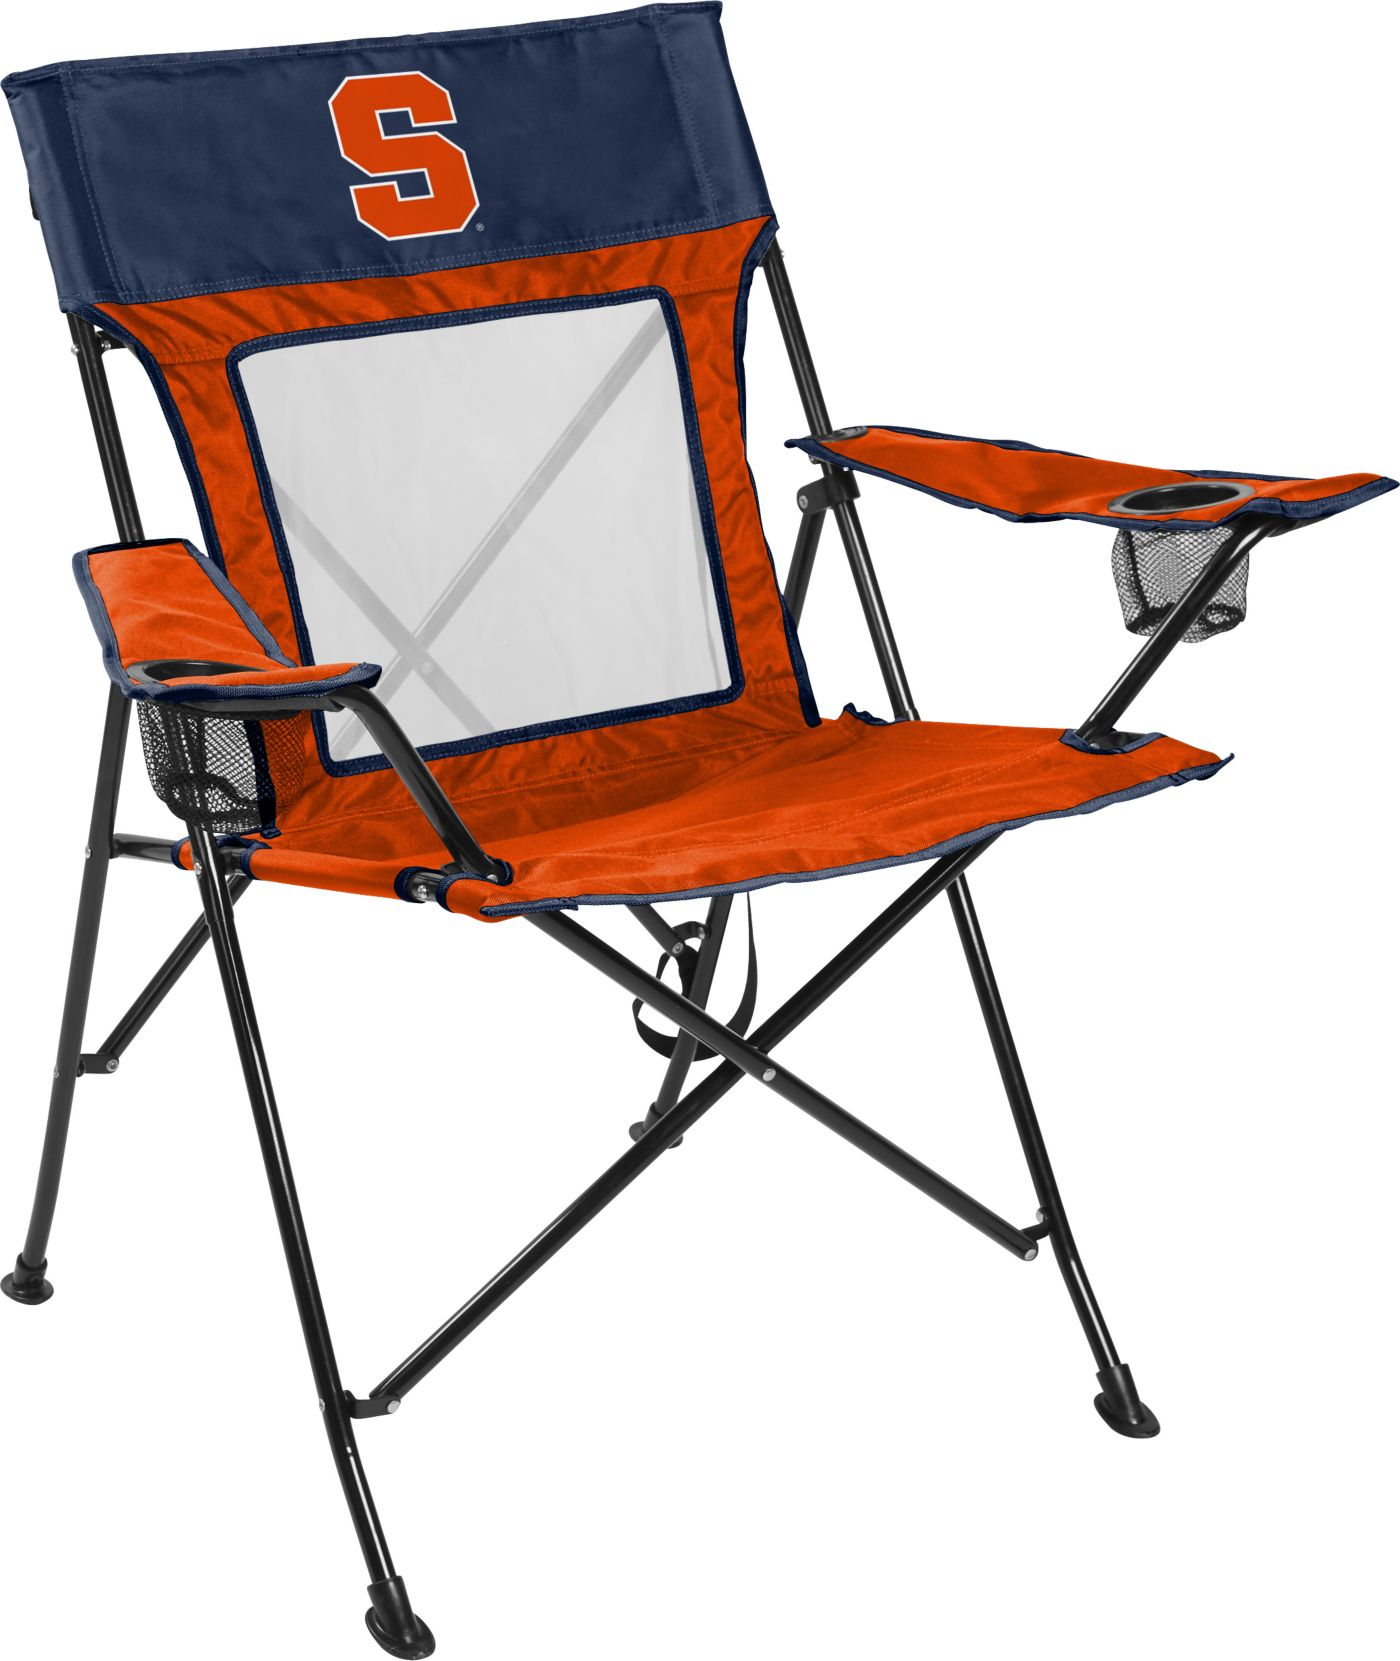 Rawlings Syracuse Orange Game Changer Chair